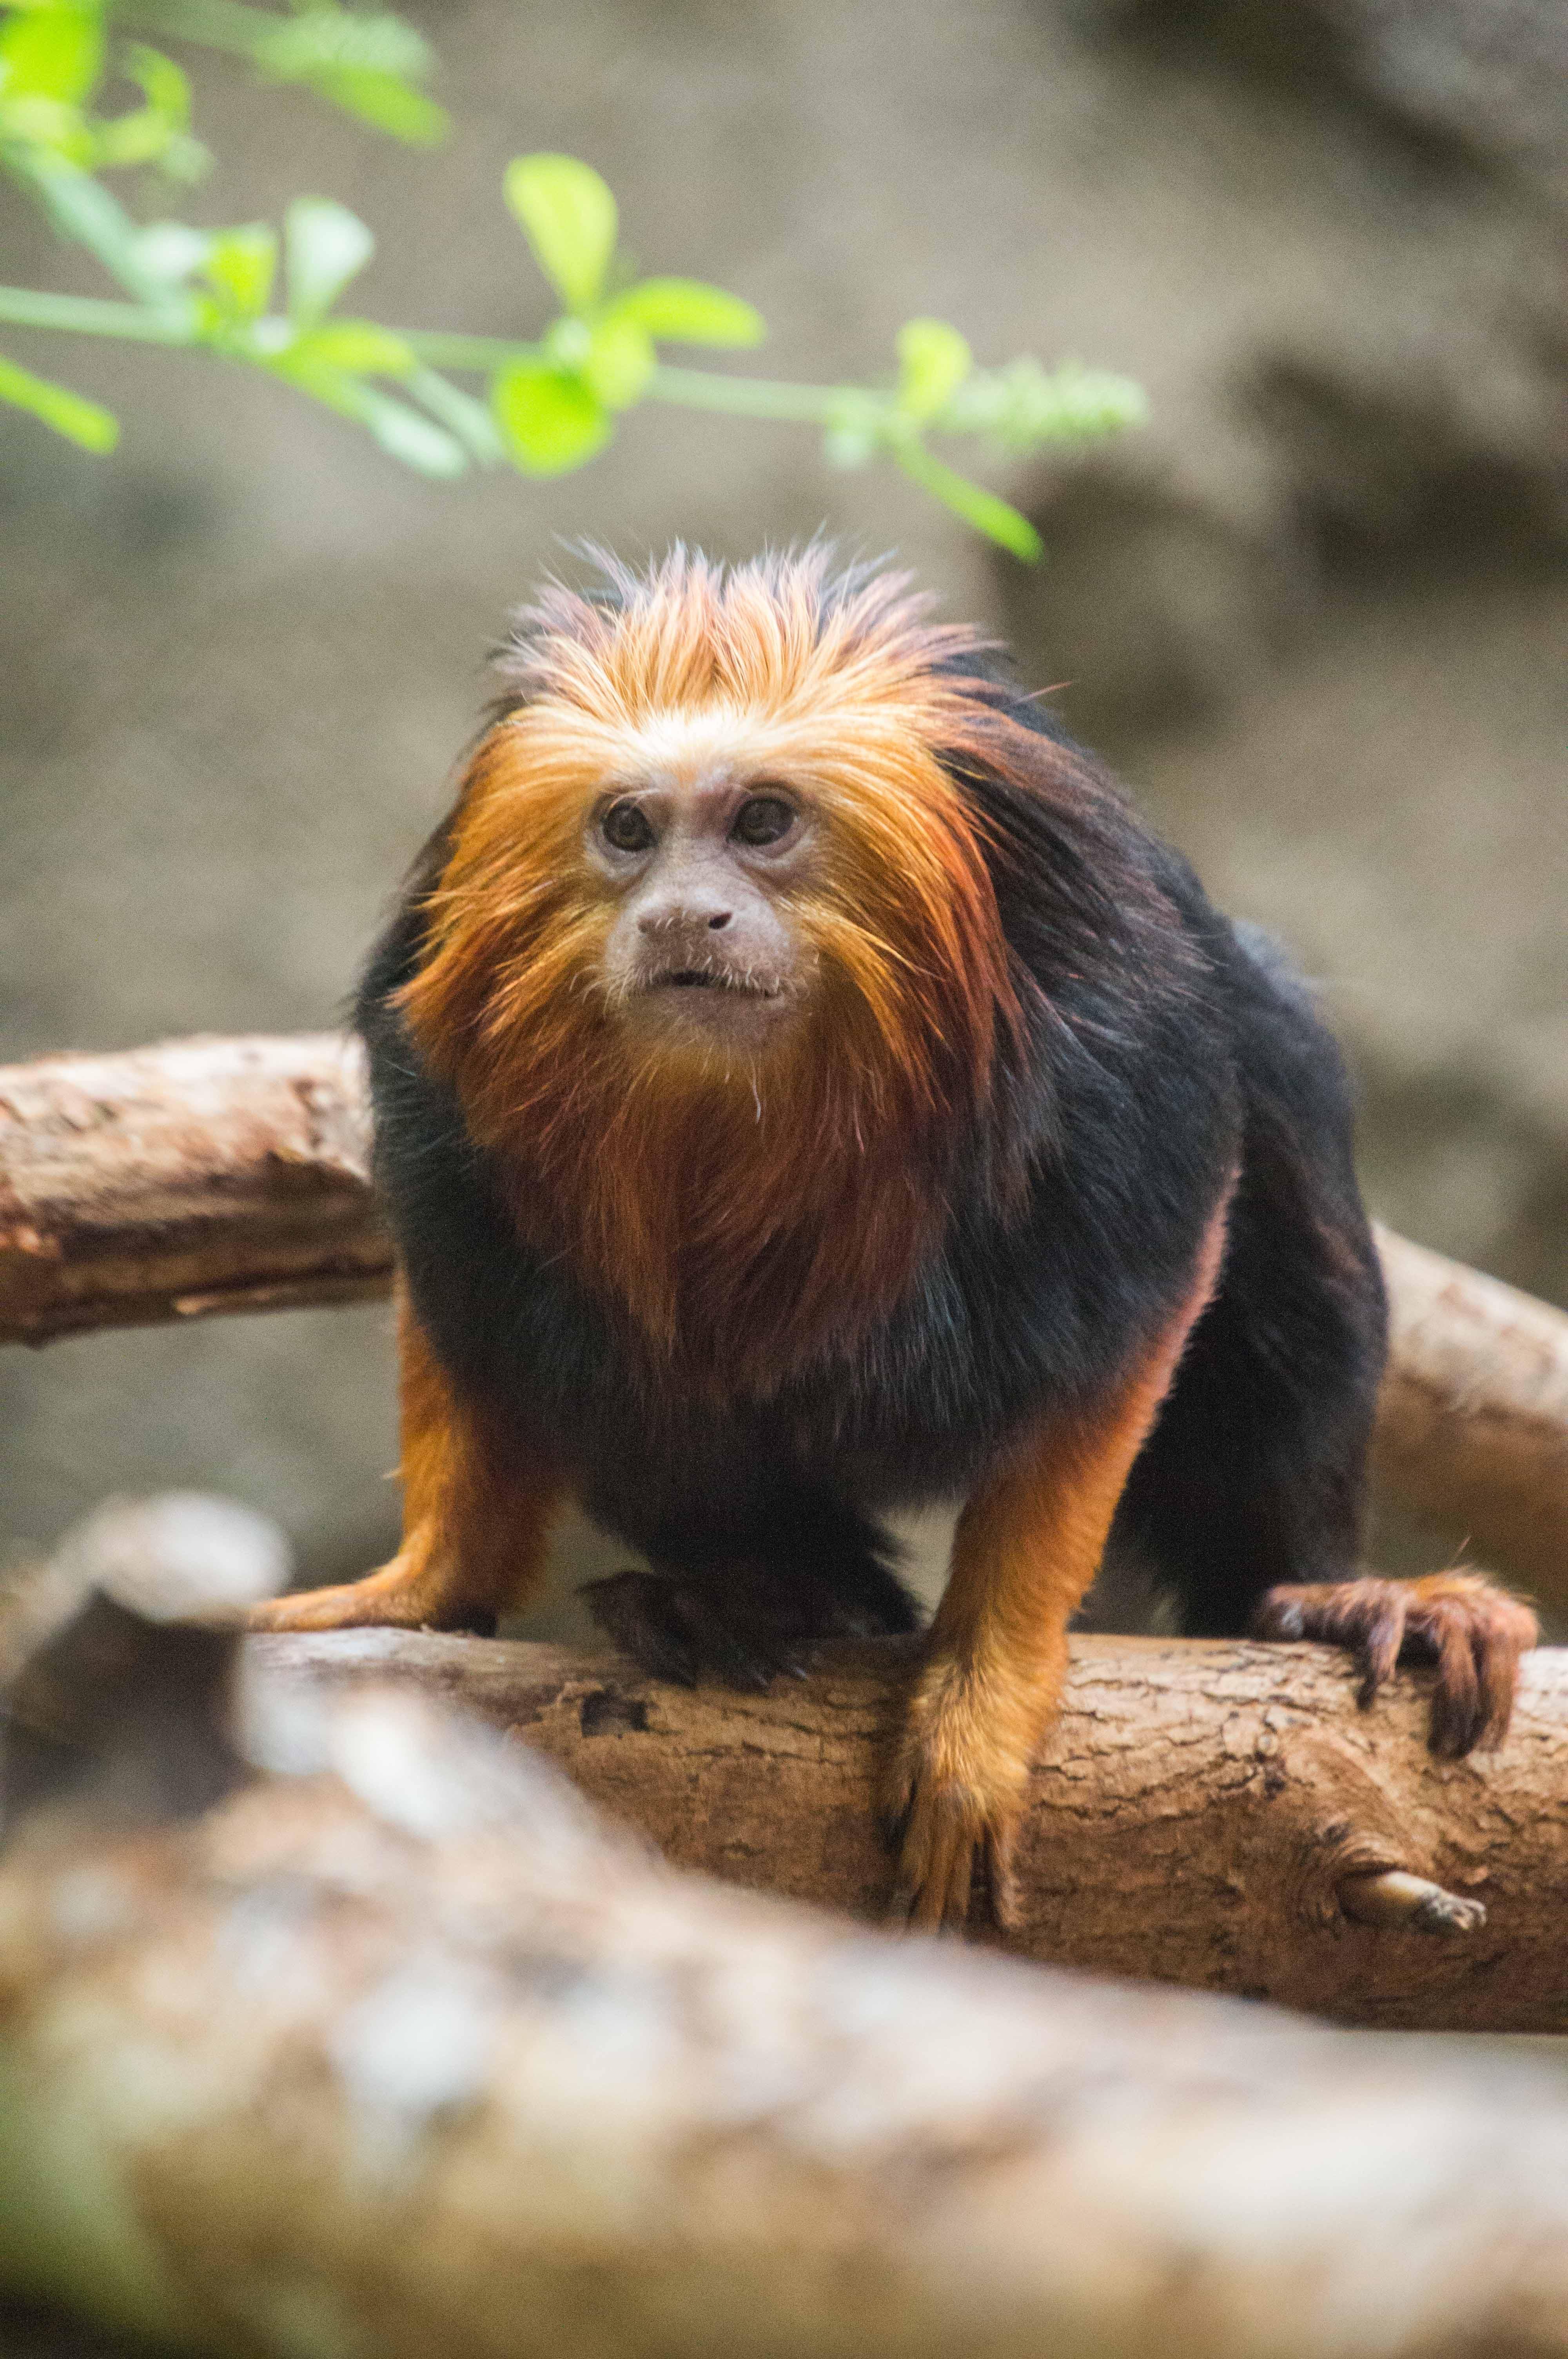 Free stock photo of animals, black monkey, golden-headed lion tamarin, monkey